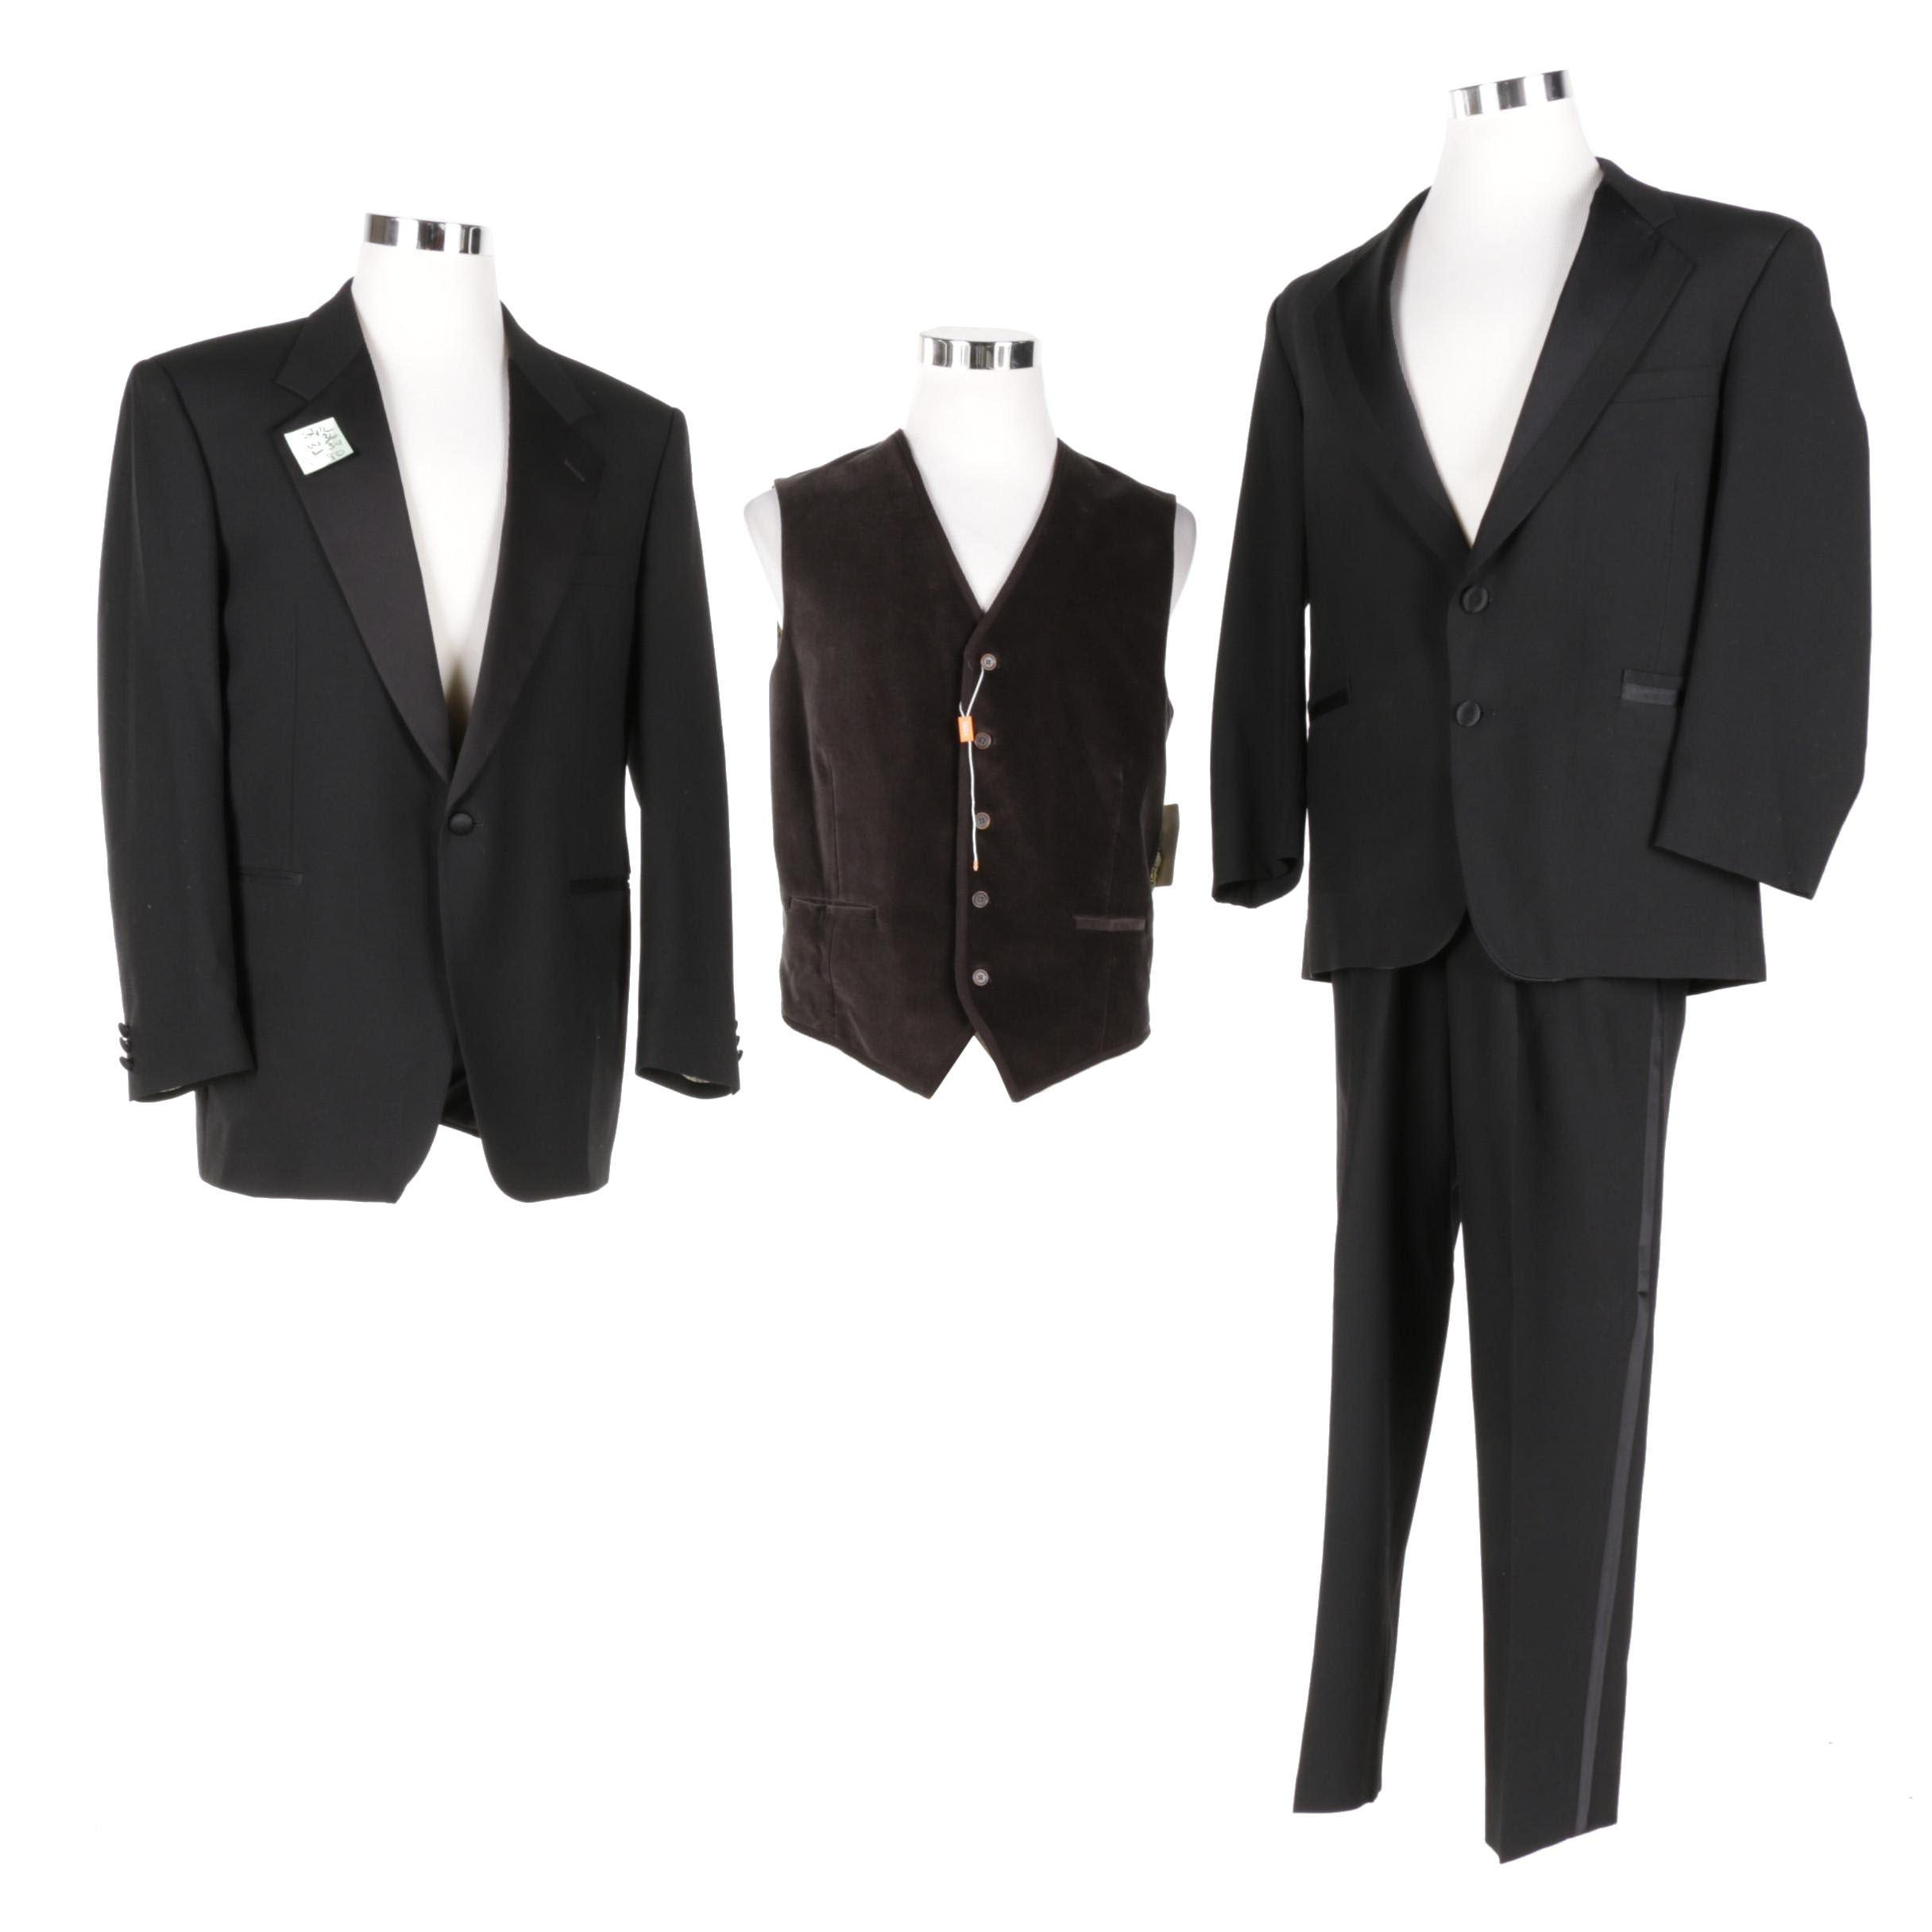 Men's Tuxedo Clothing